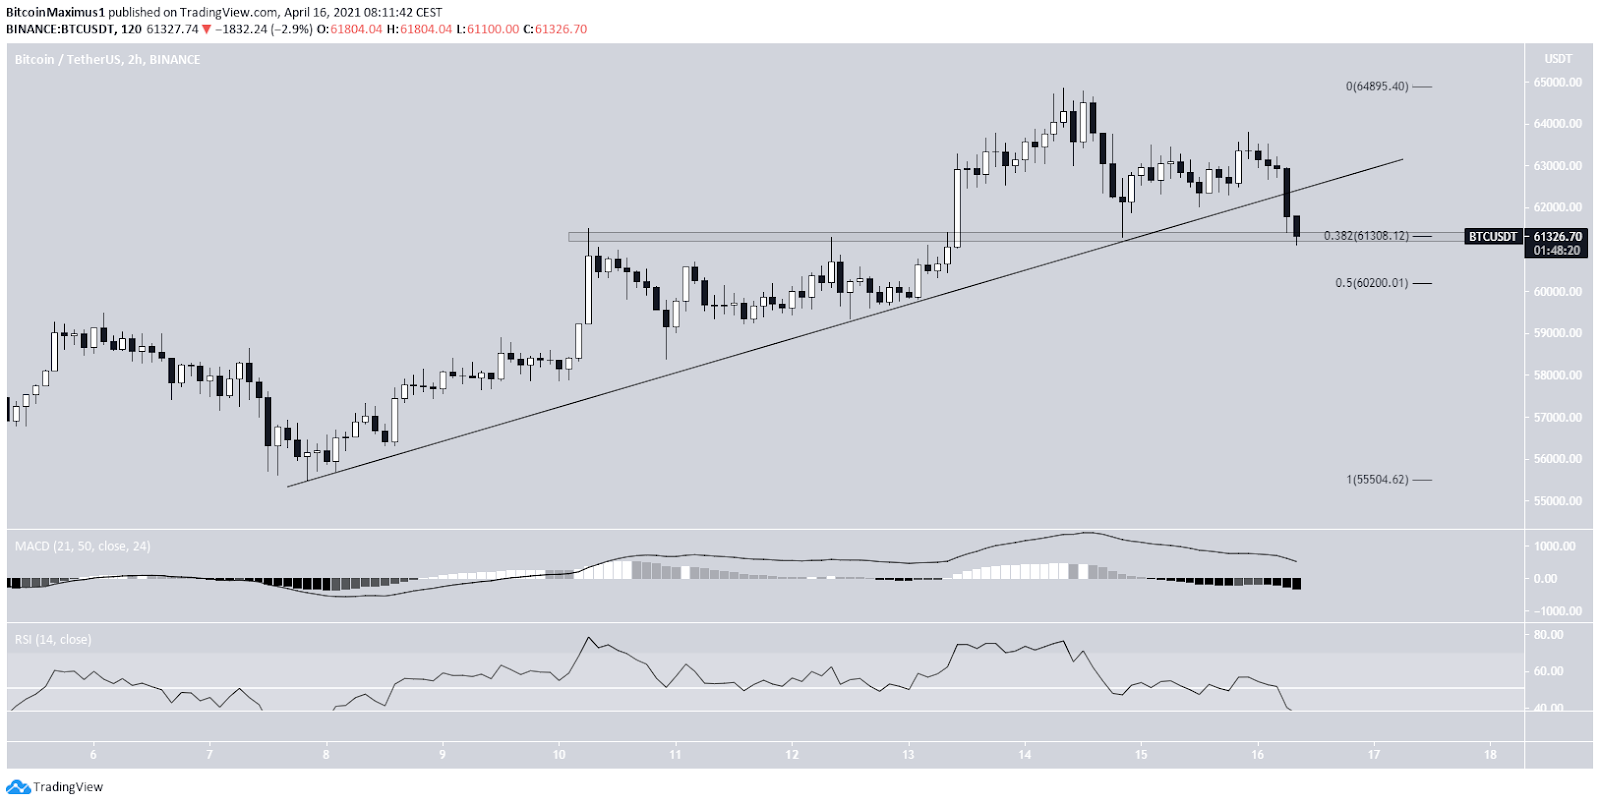 Bitcoin Preis 2-Stunden-Chart By TradingView